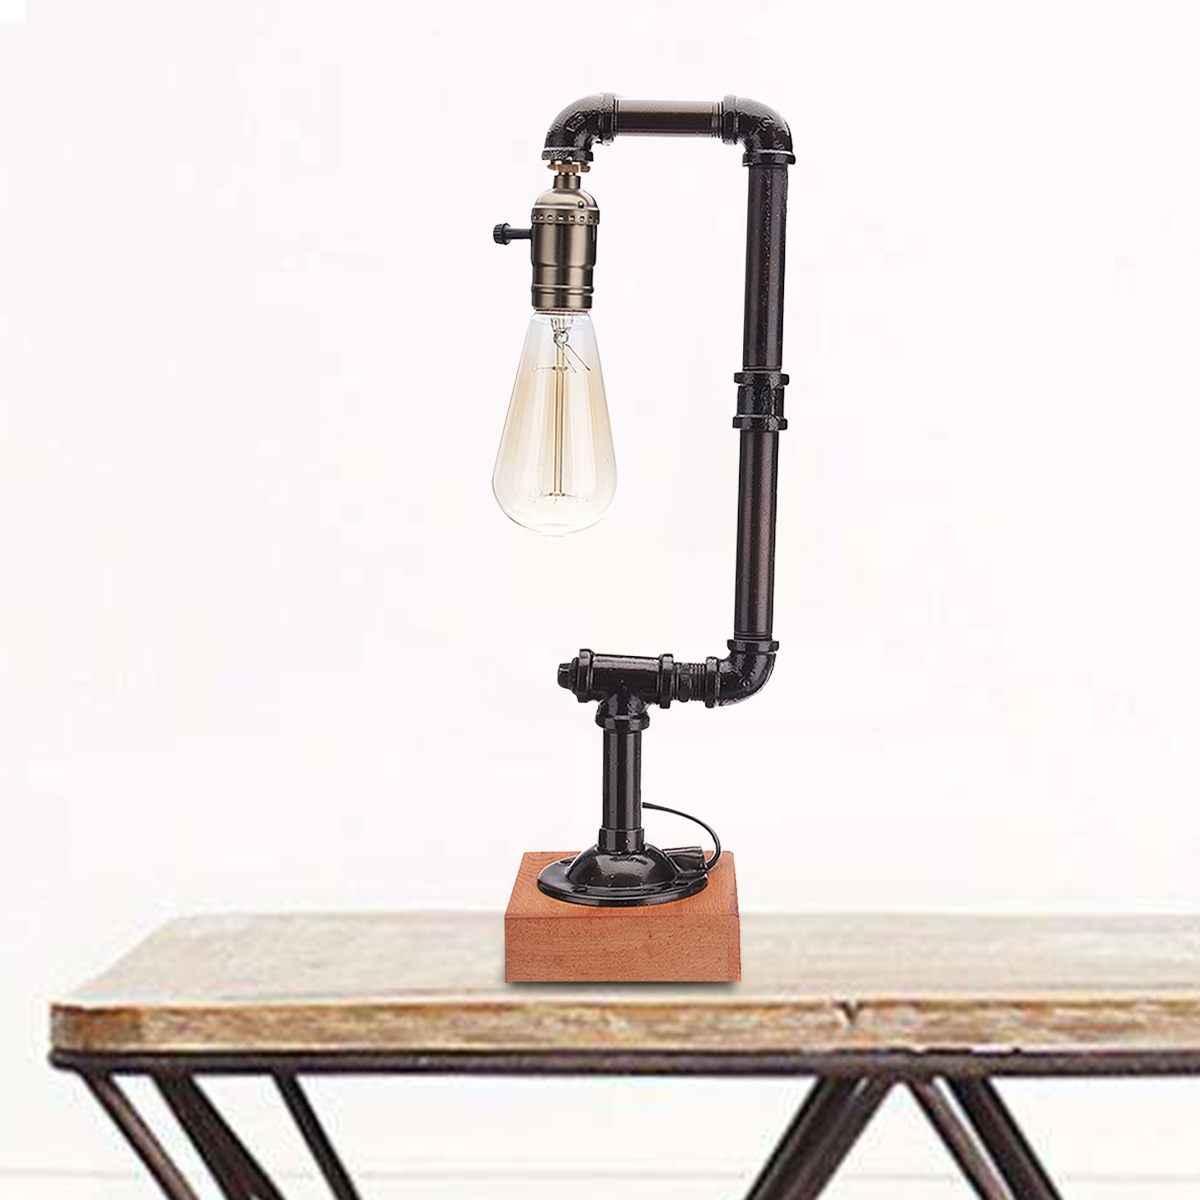 110-240V Vintage E27 bombilla Industrial tubo lámpara de mesa lámpara led para mesa de escritorio linterna accesorio interior hogar dormitorio decoración regalos